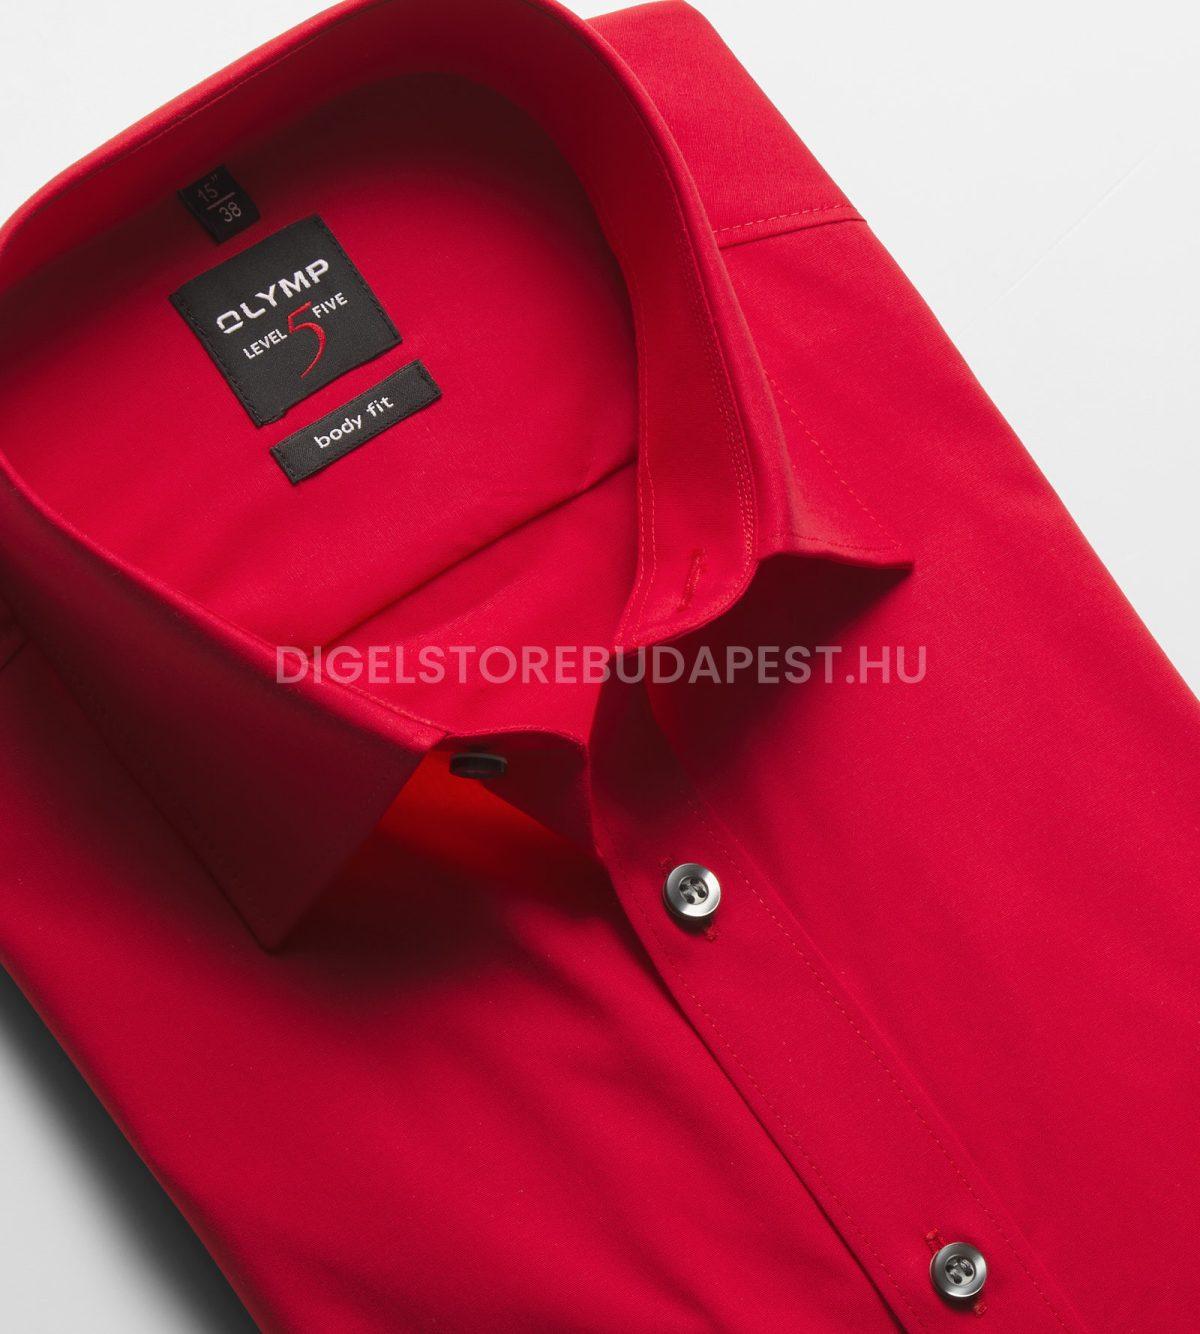 OLYMP Level Five piros body fit vasaláskönnyített ing-1-1-6090-64-35-02